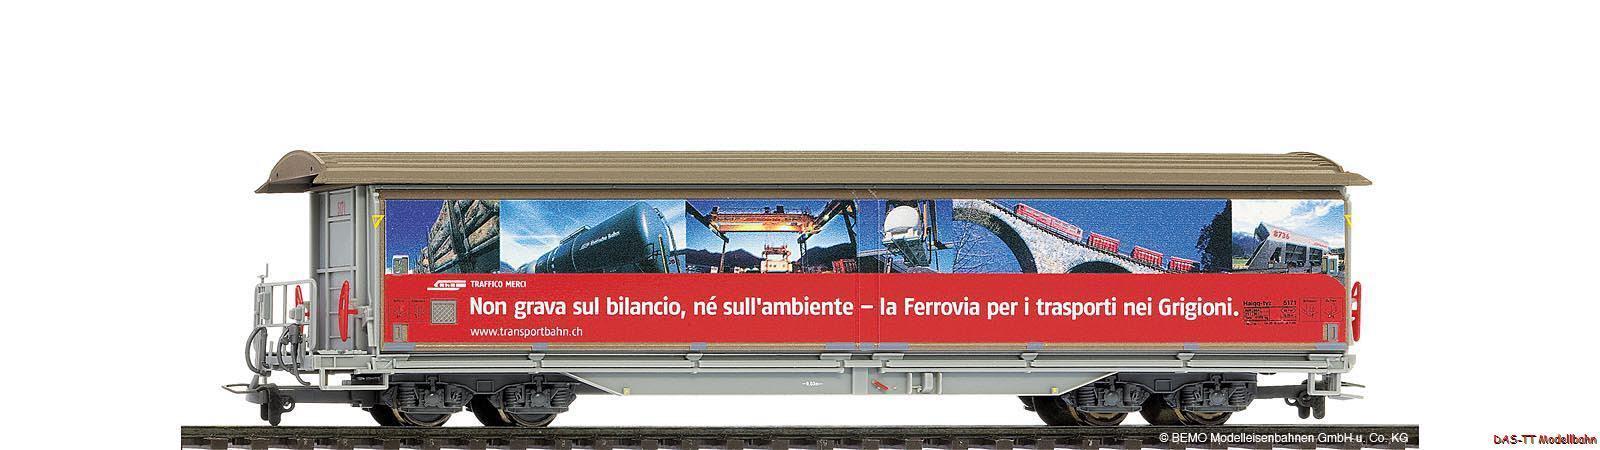 H0m RHB haiqqTYZ 5171 RHB trasporto ferroviario EP. V BEMO 2288141 NUOVO